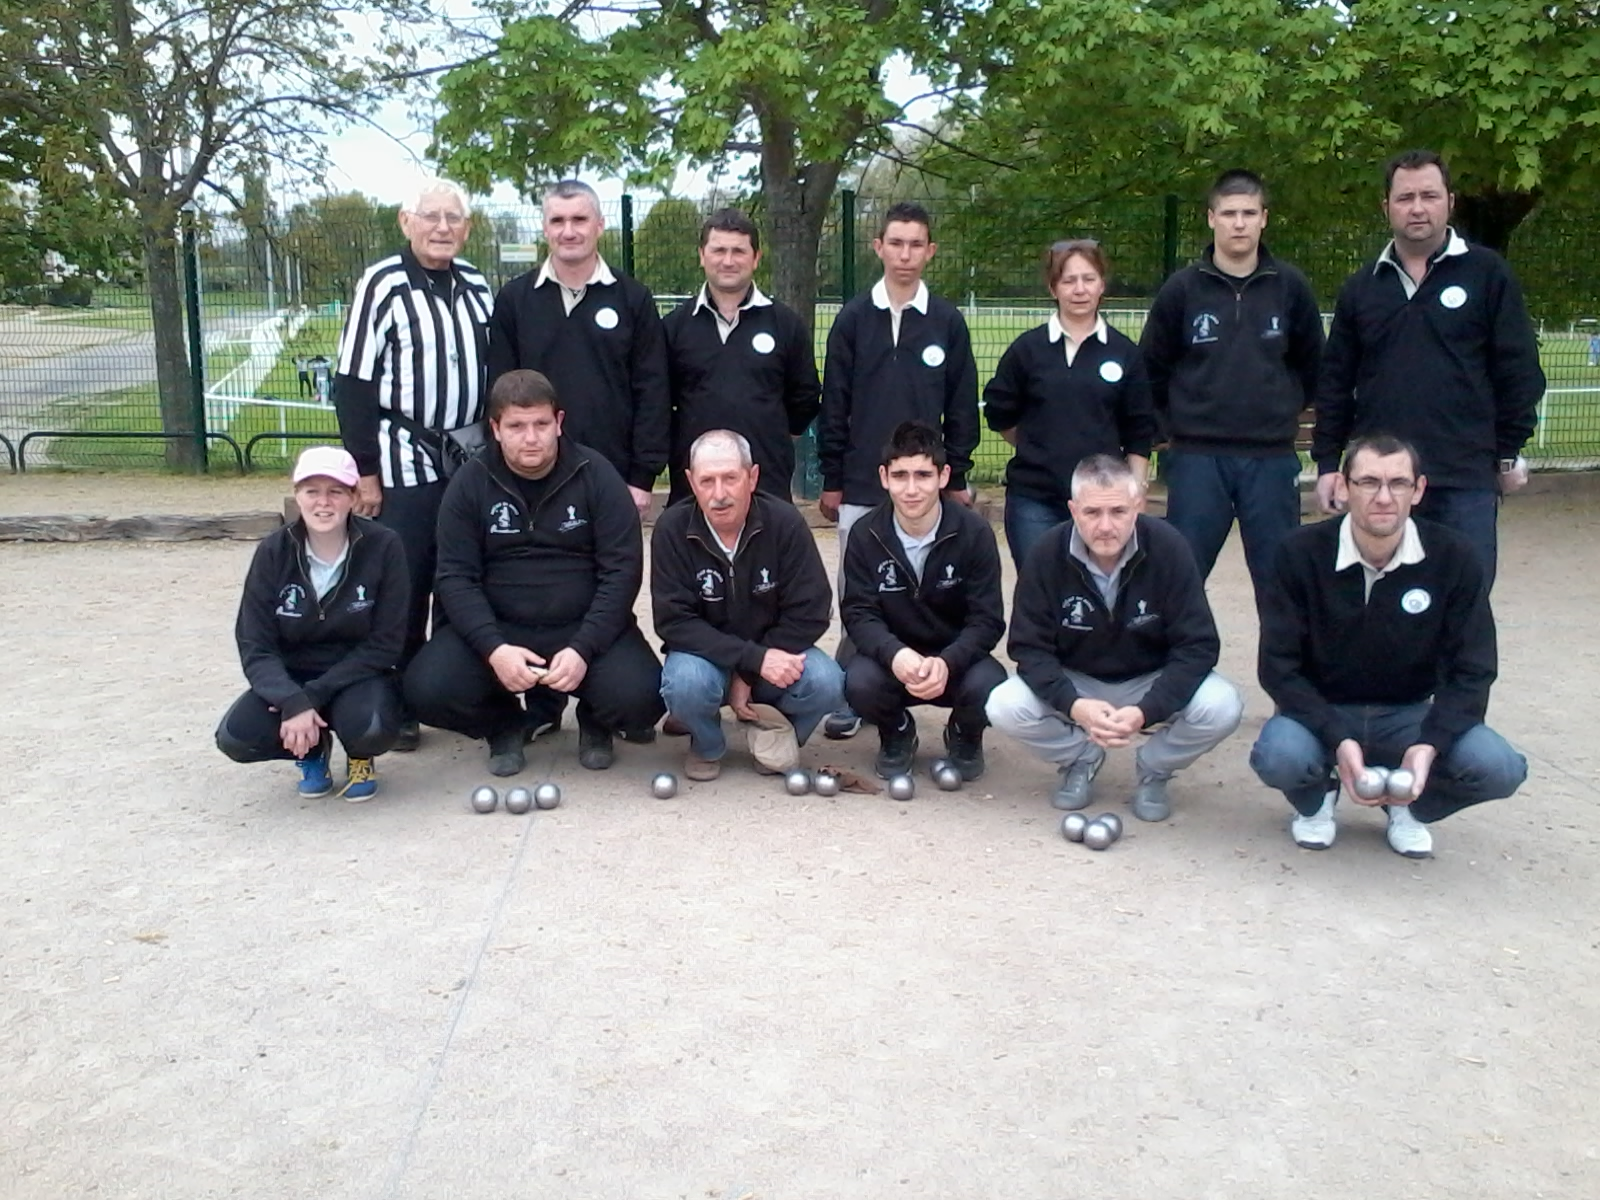 Coupe de france 2014 1er tour - Coupe de france 1er tour ...